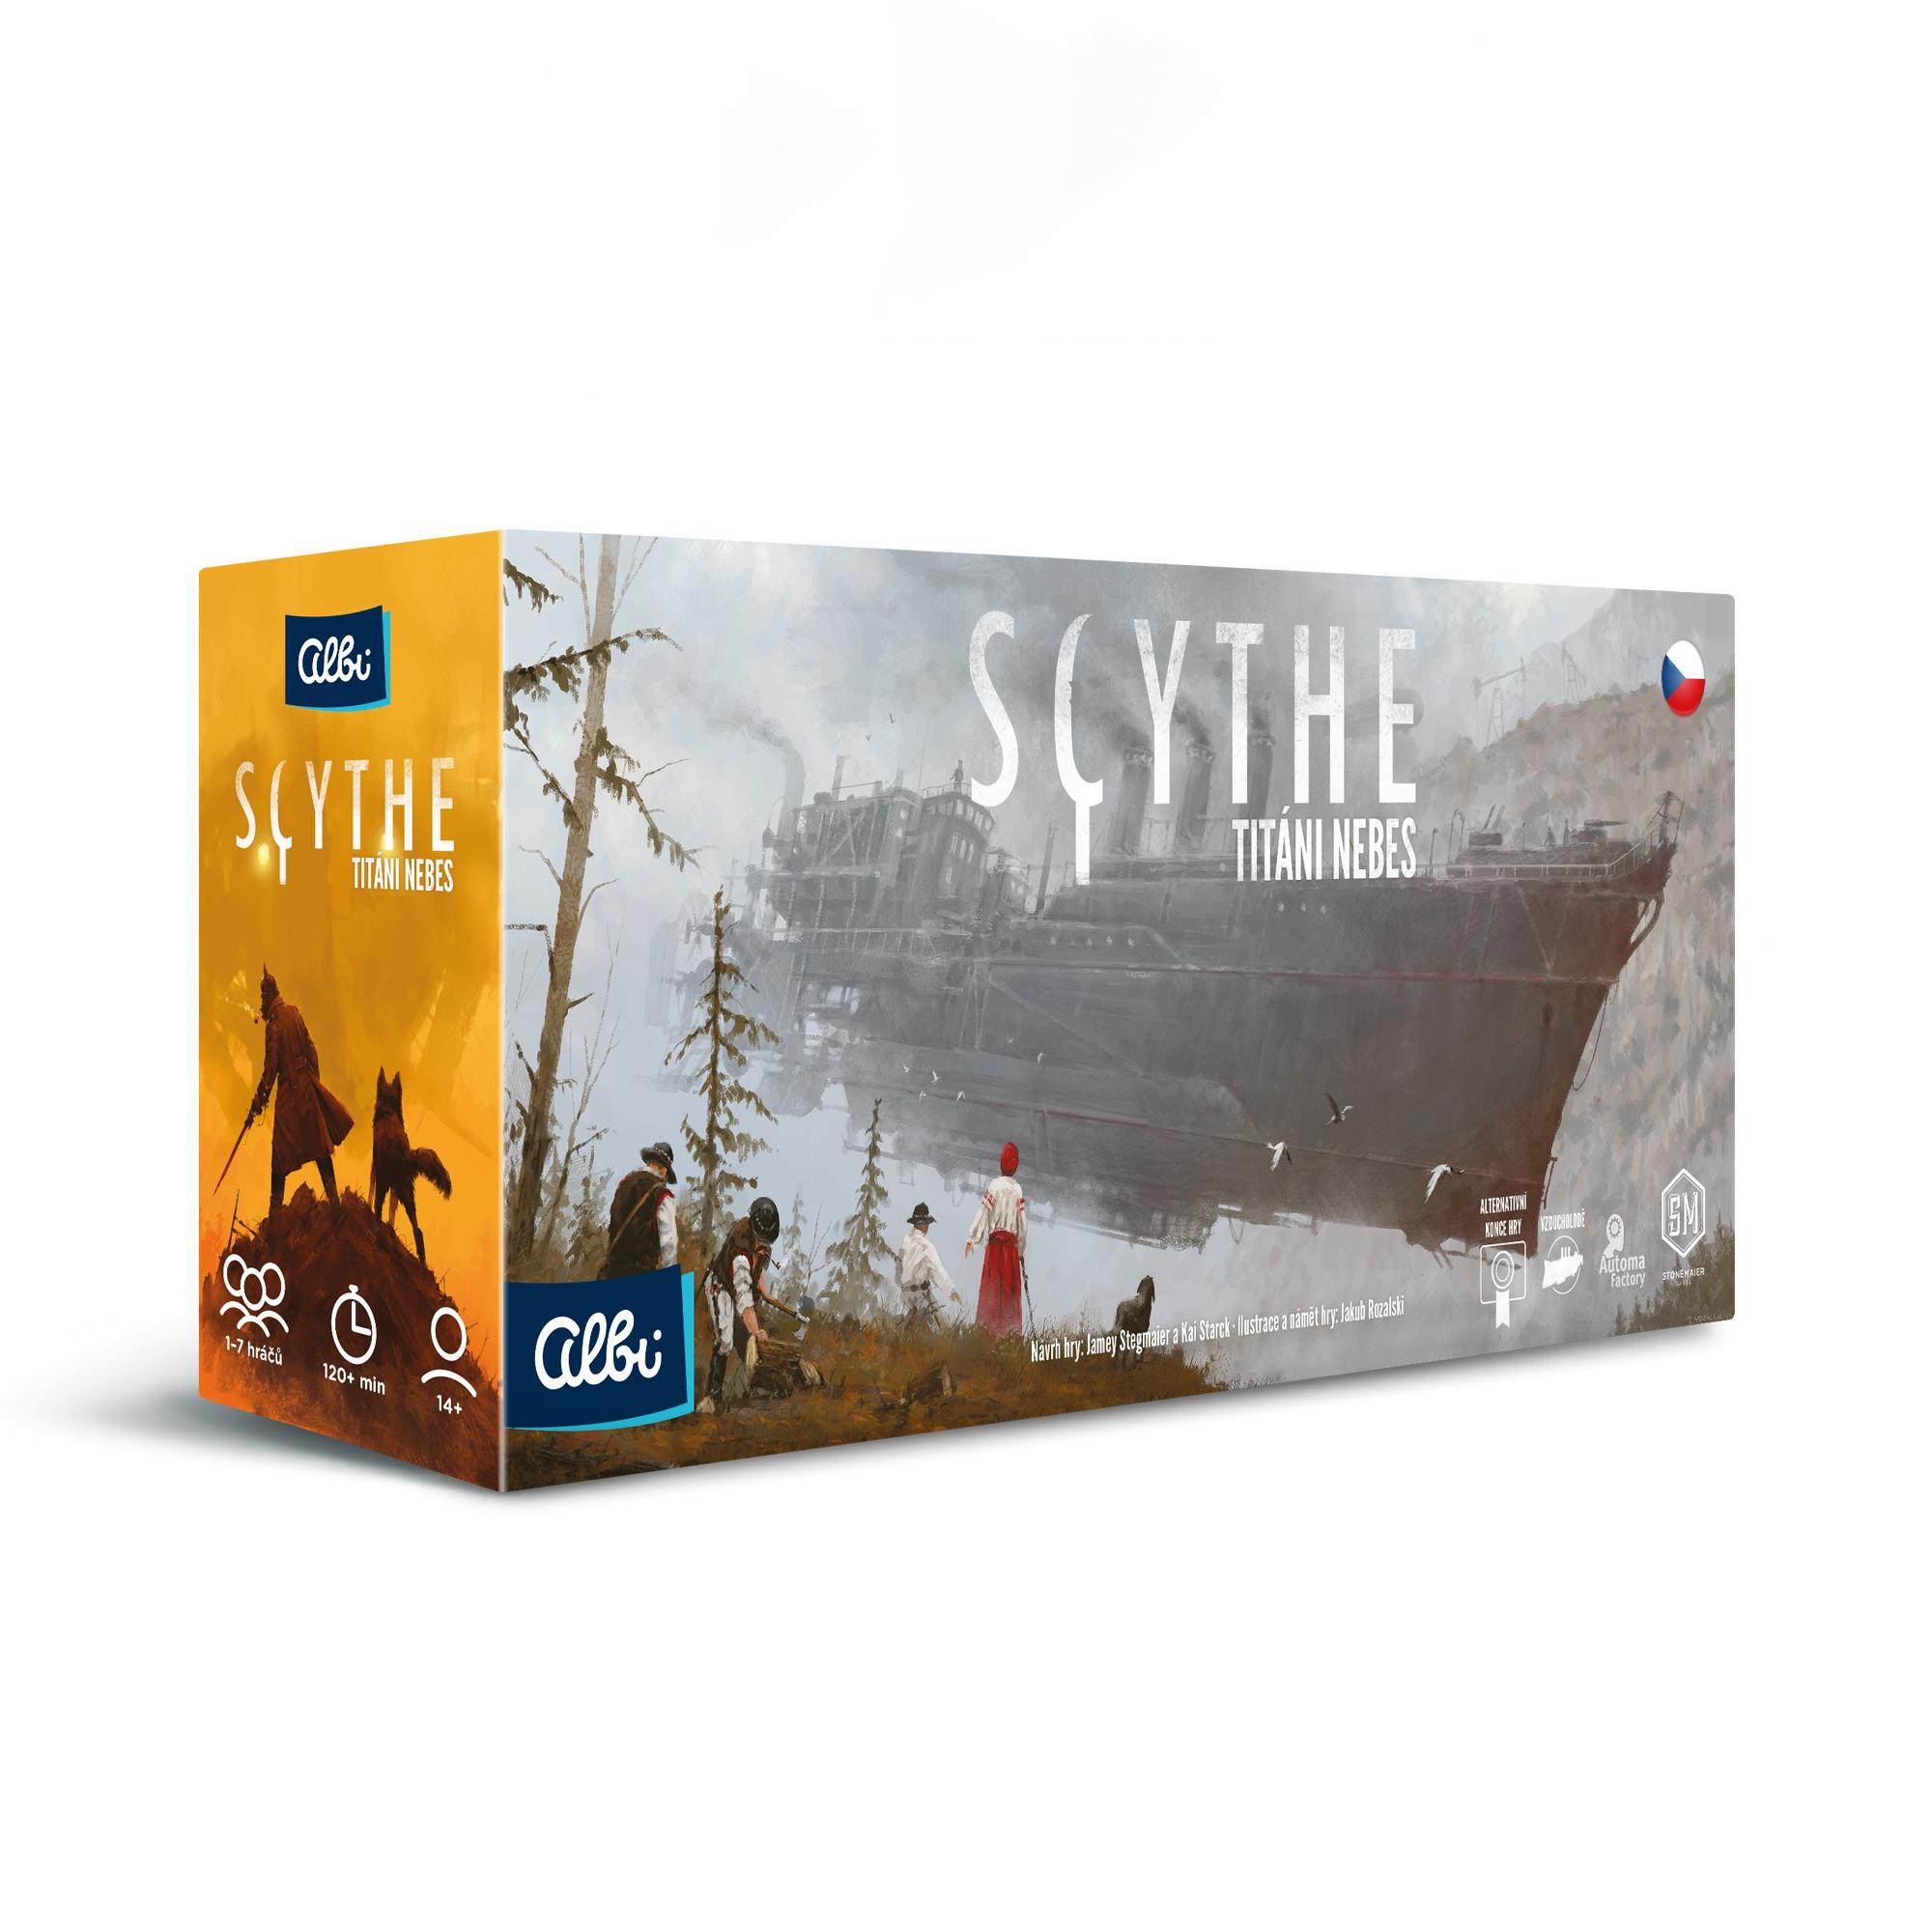 Scythe - Titáni nebes